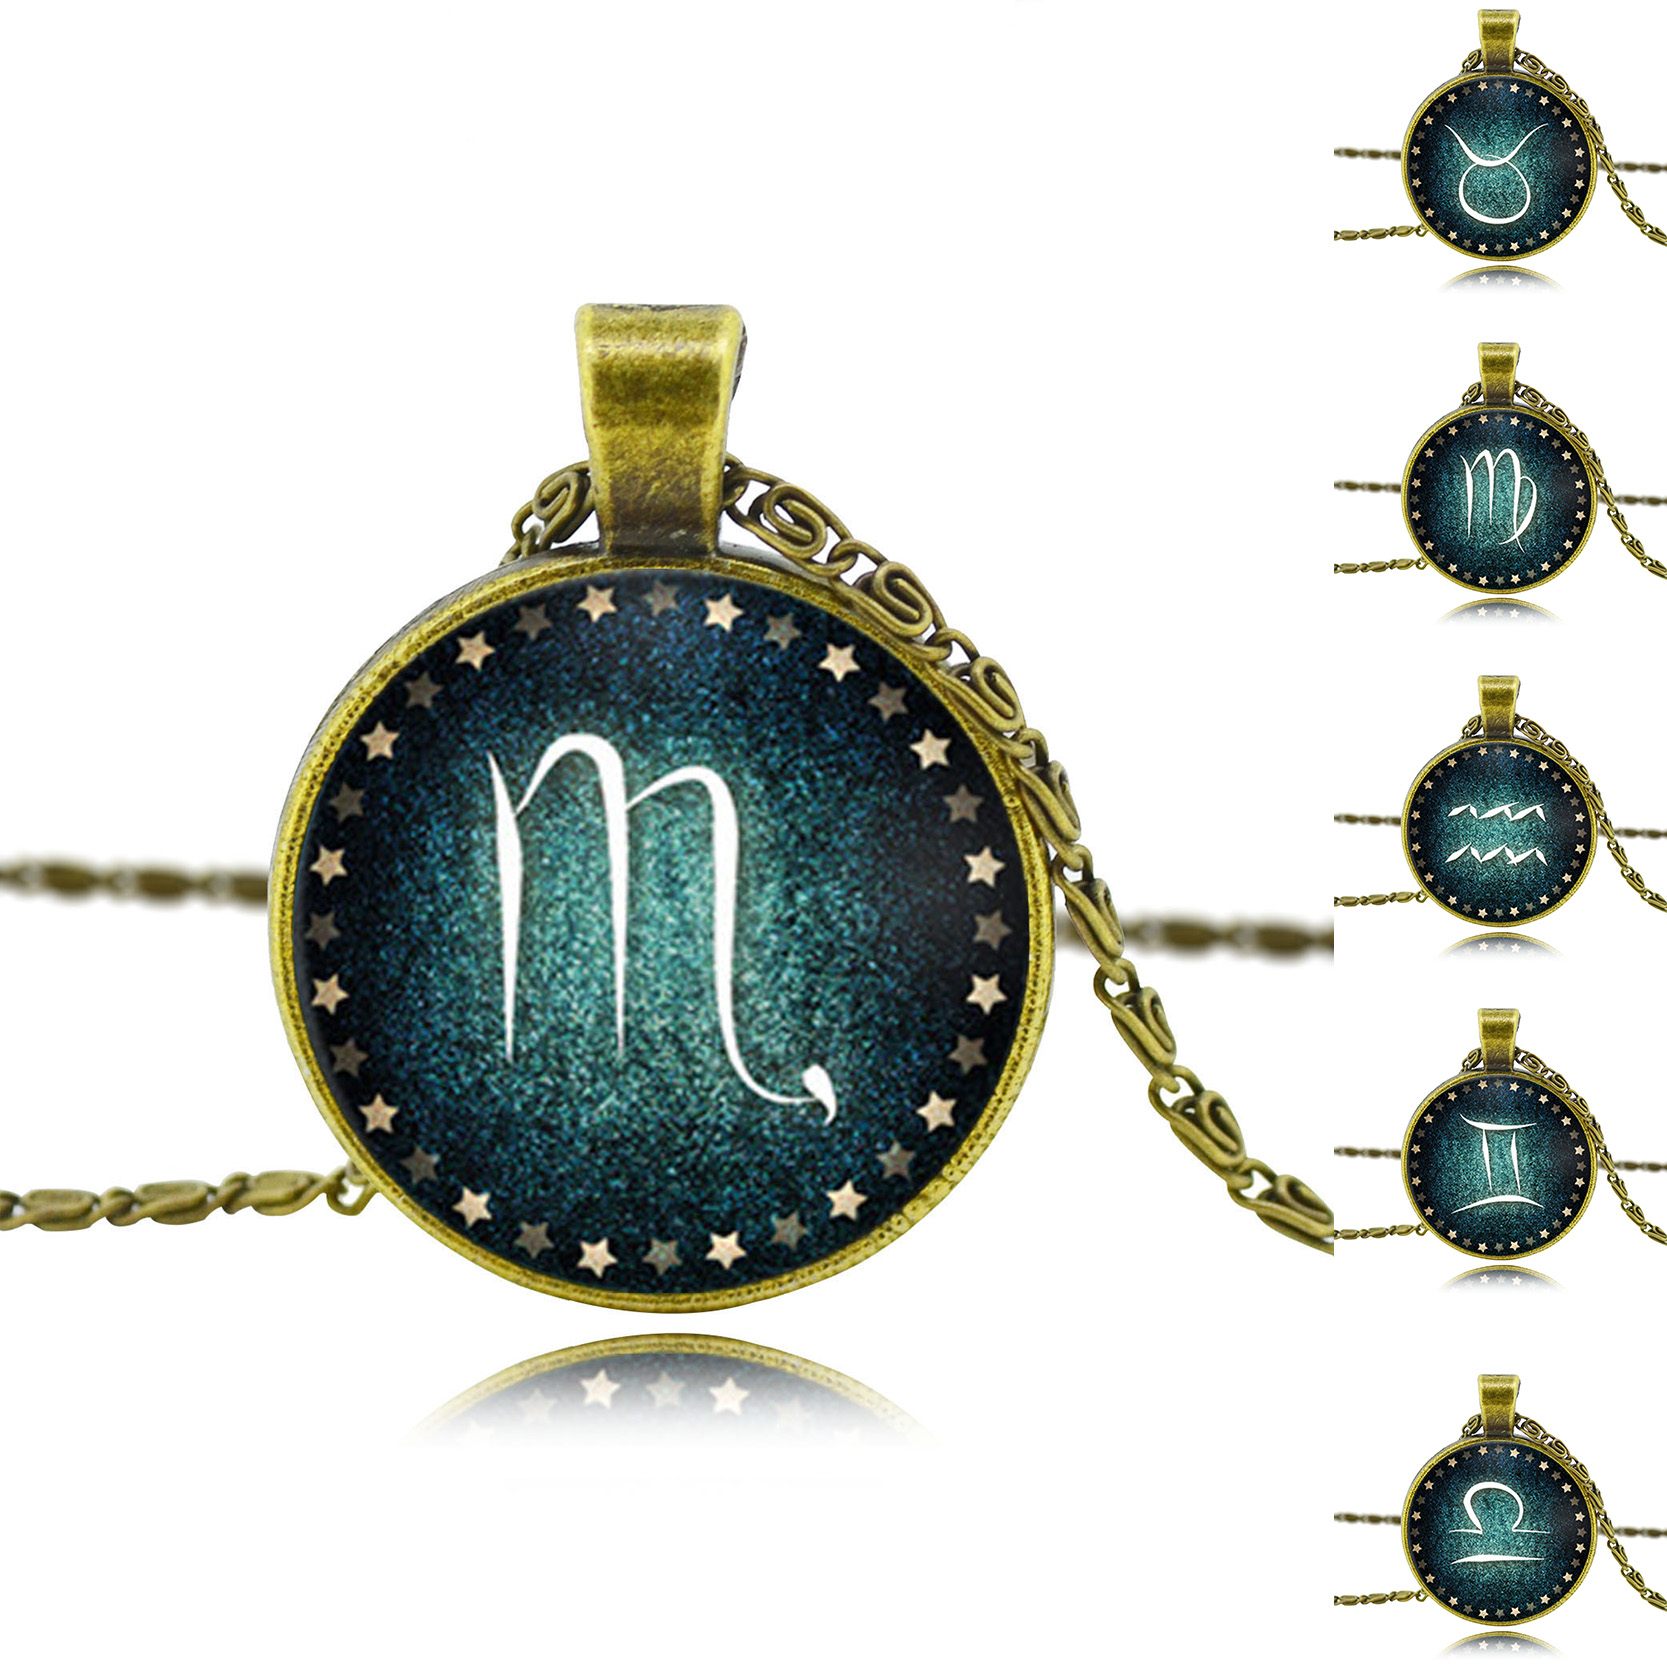 Vintage Antique Bronze Chain Statement Necklaces Fashion Zodiac Pendant Necklaces For Women Cabochon Glass Necklaces Jewelry HOT(China (Mainland))